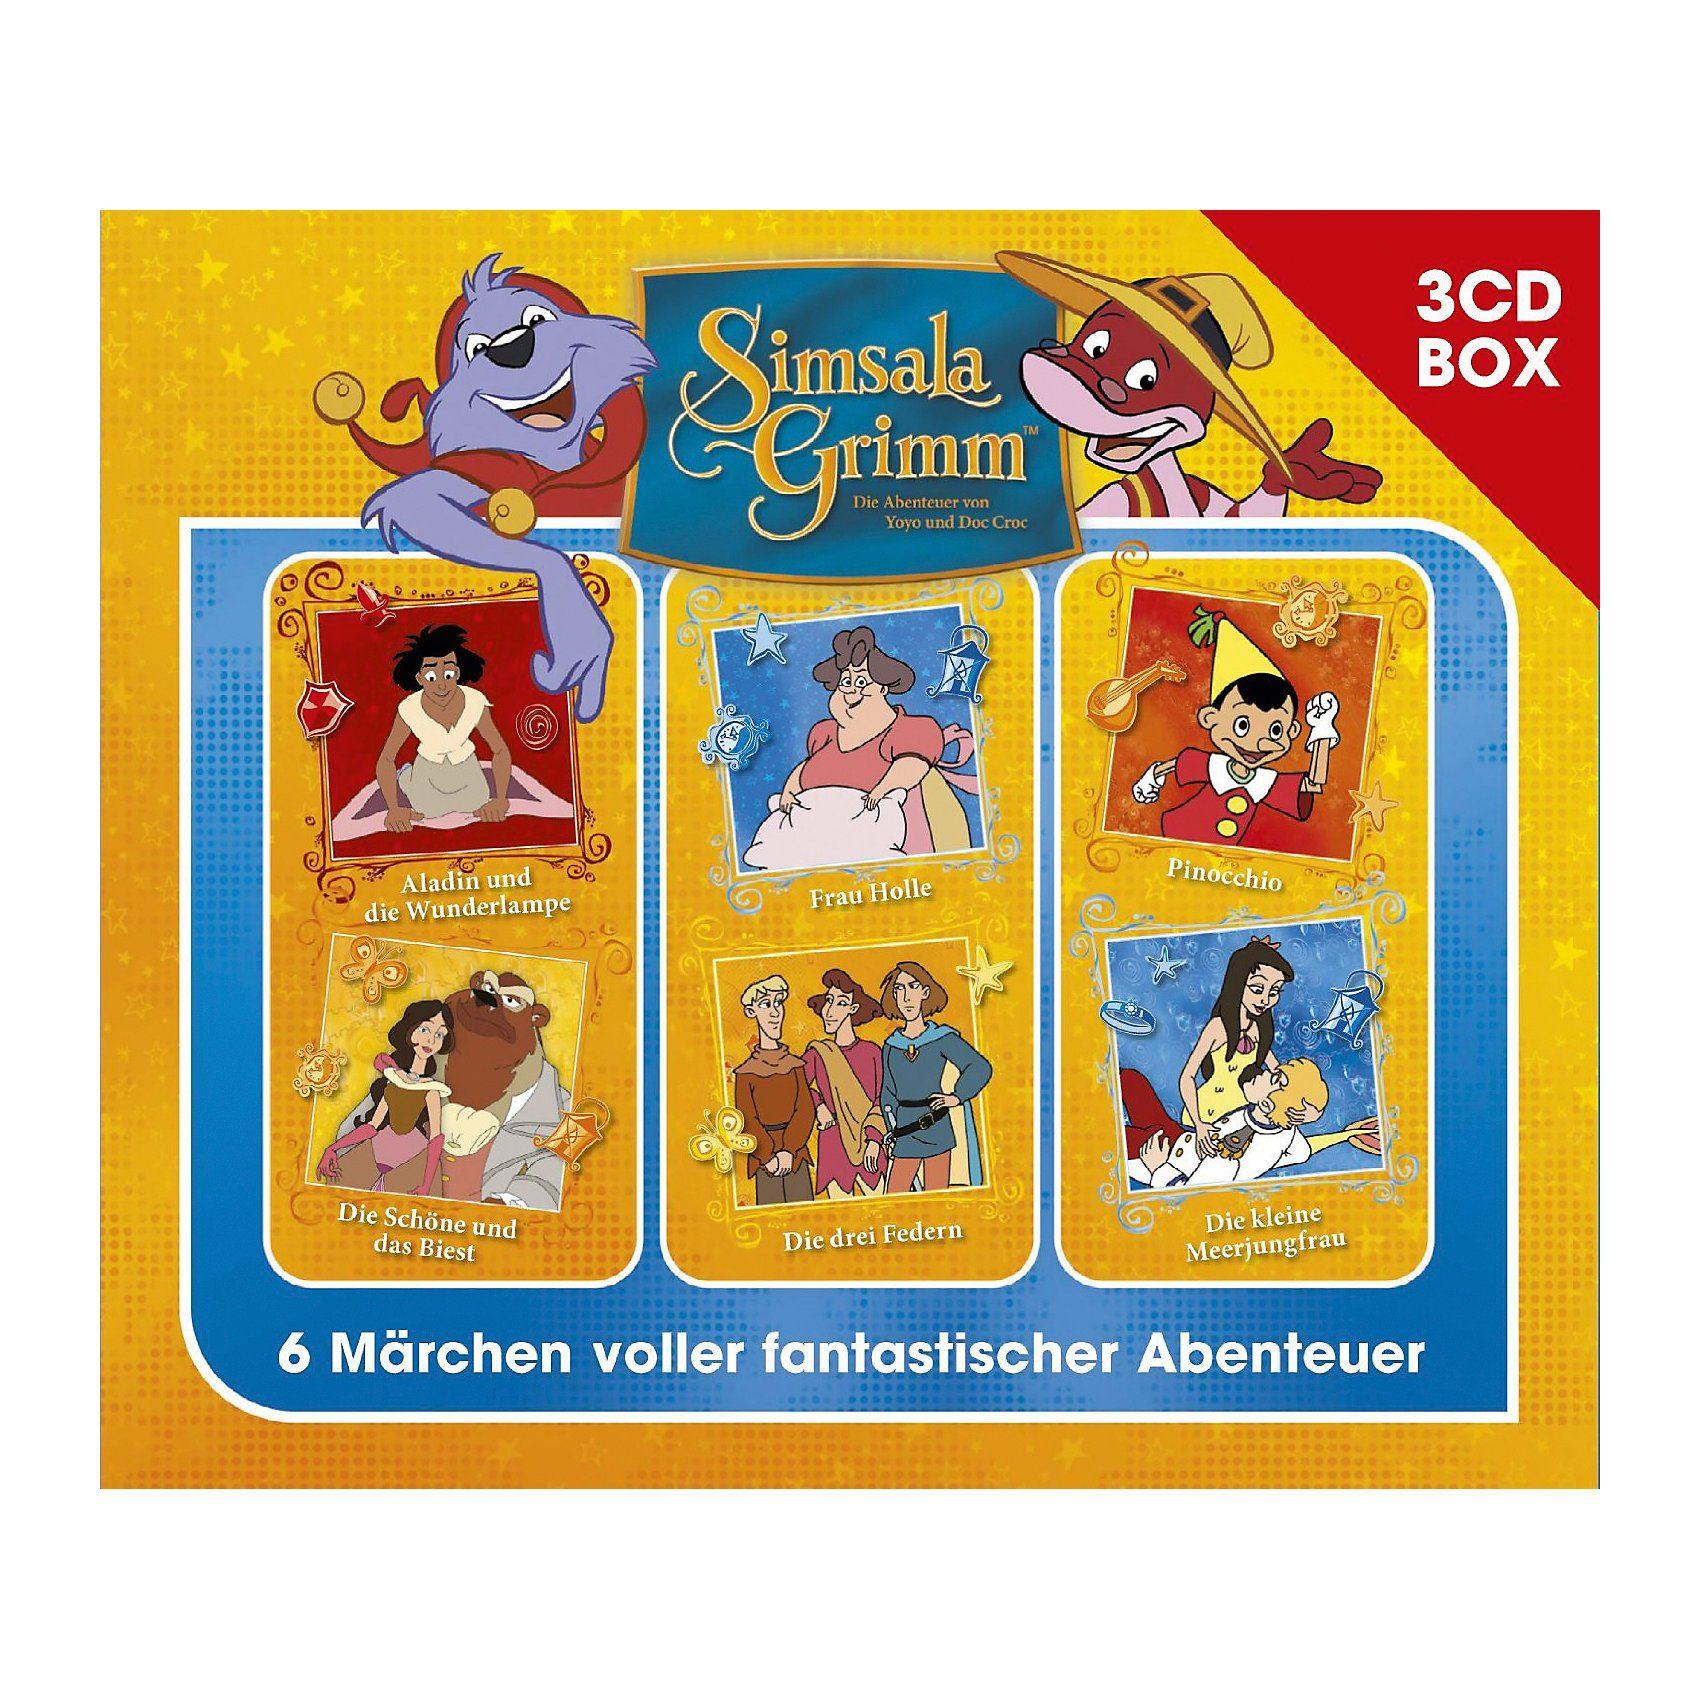 Universal CD SimsalaGrimm - 3CD Hörspielbox Vol.4